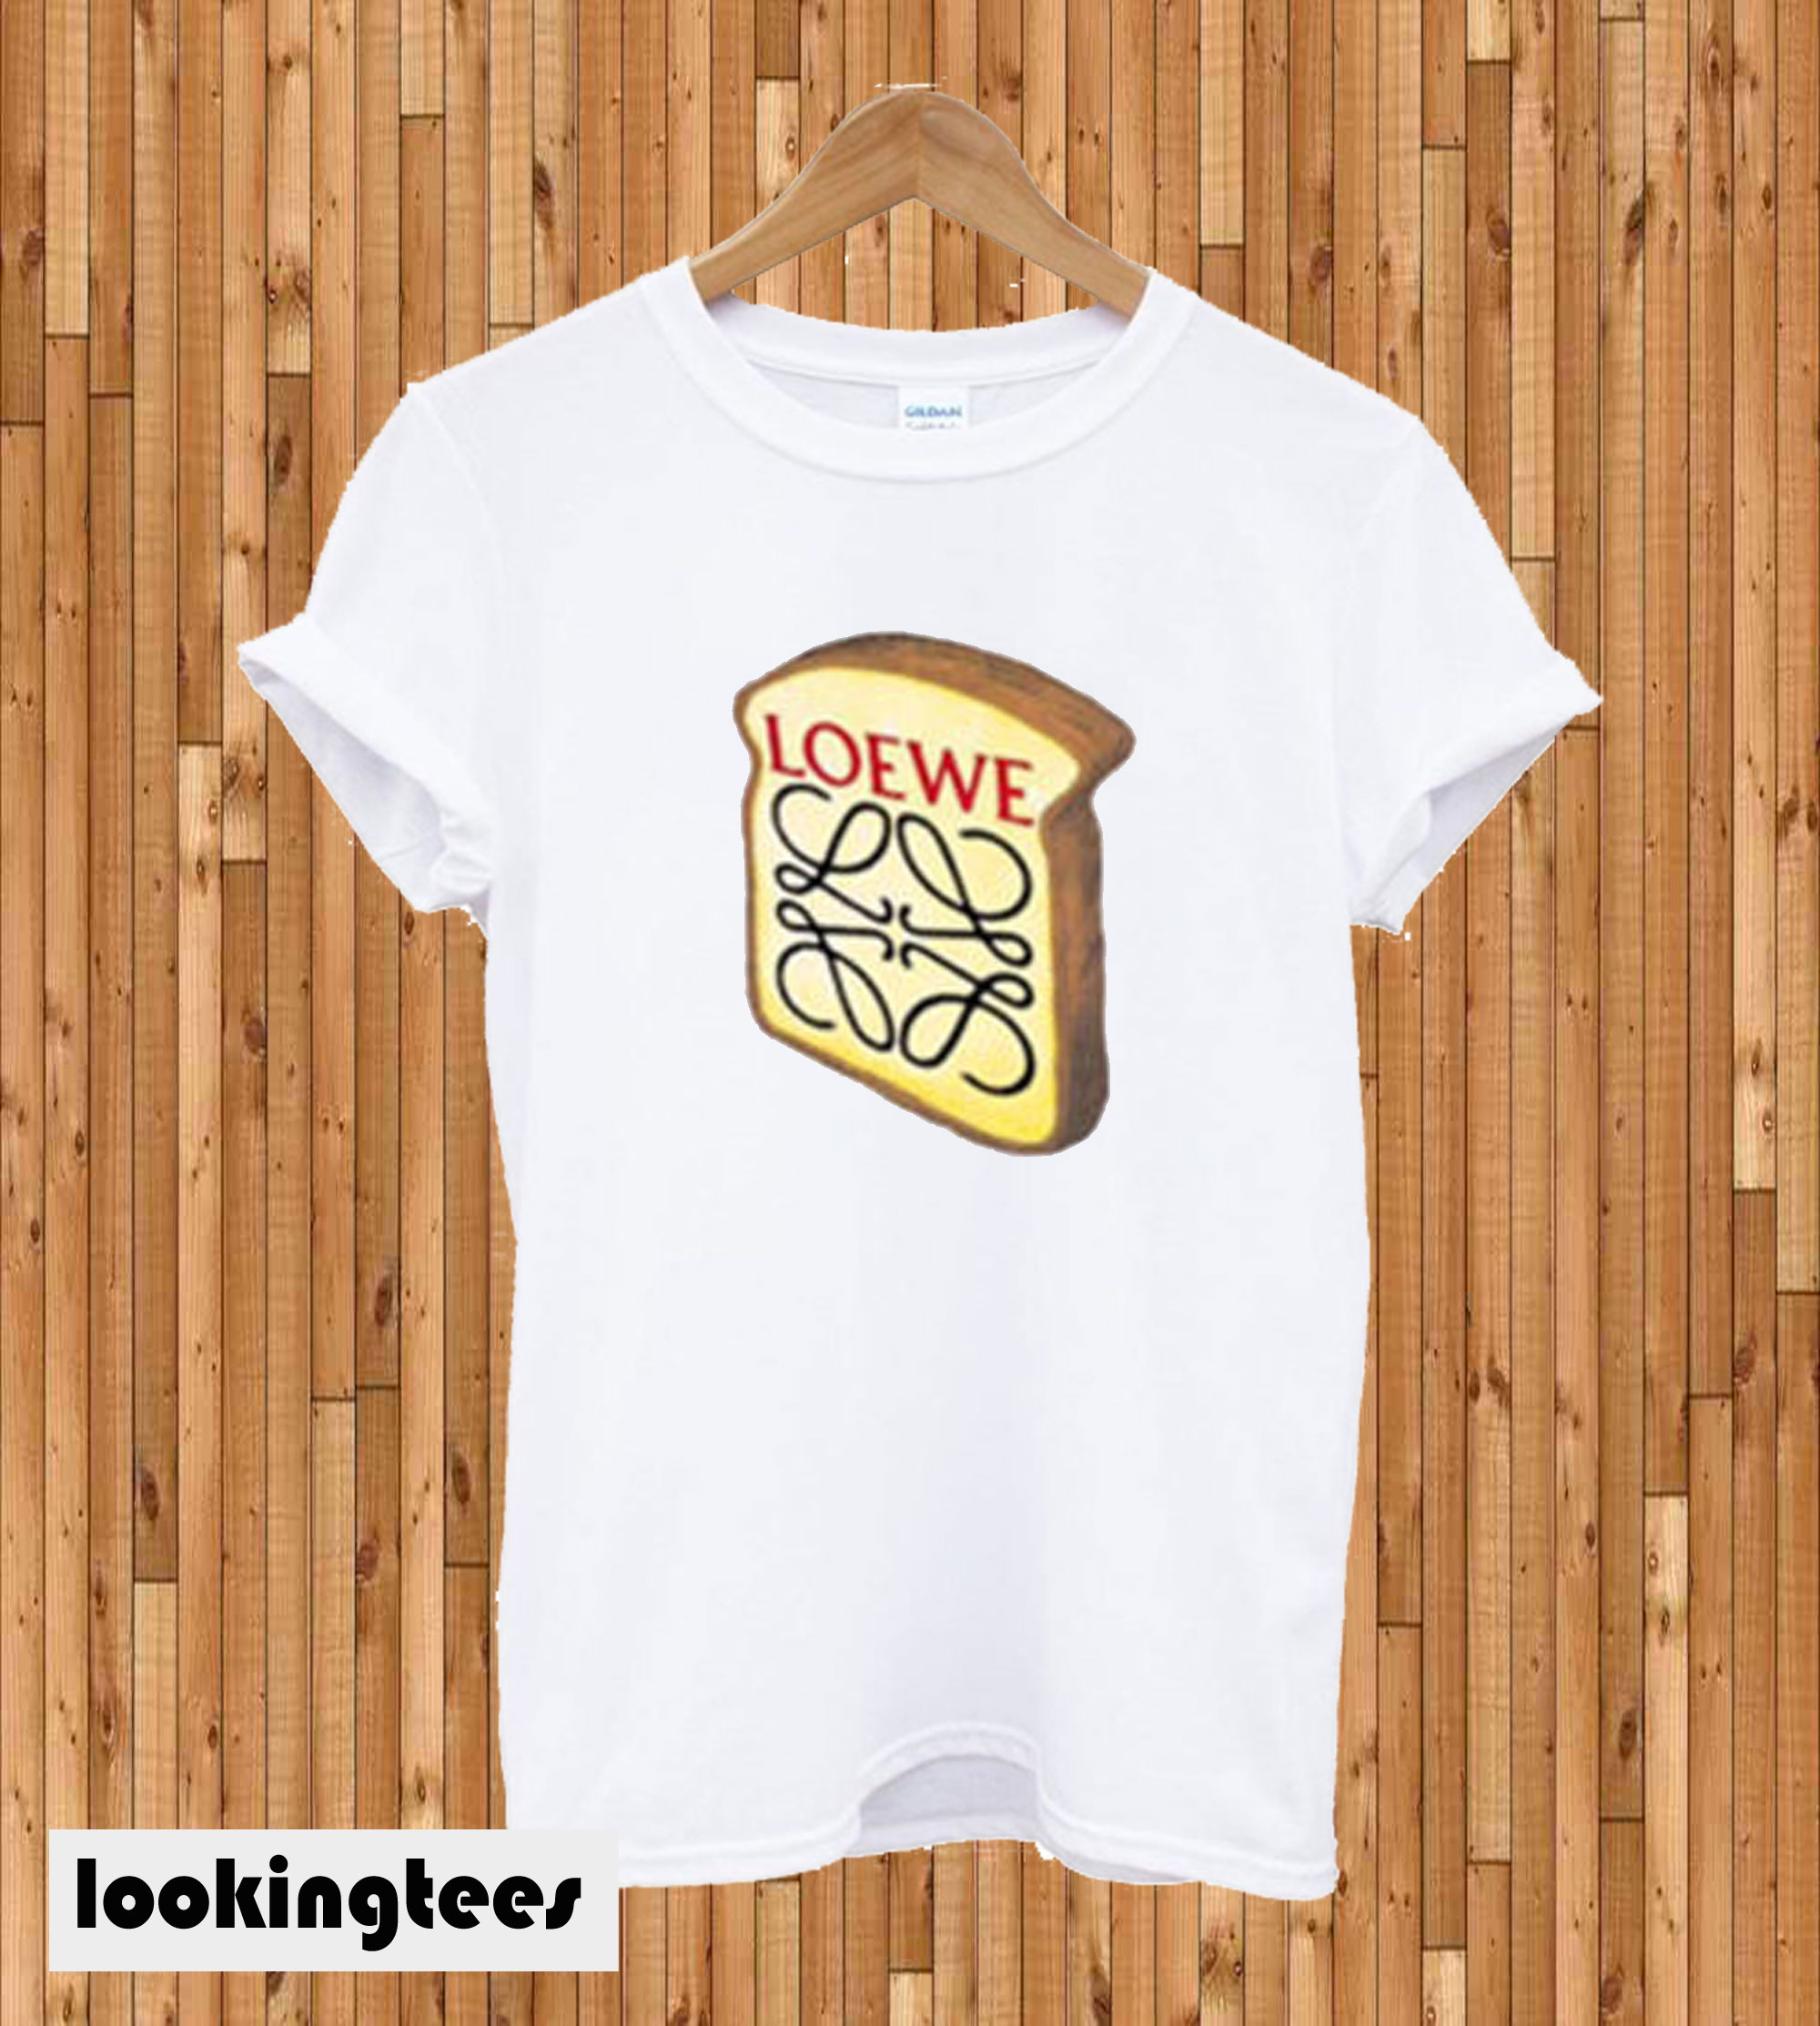 Loewe Toast Bread T-shirt